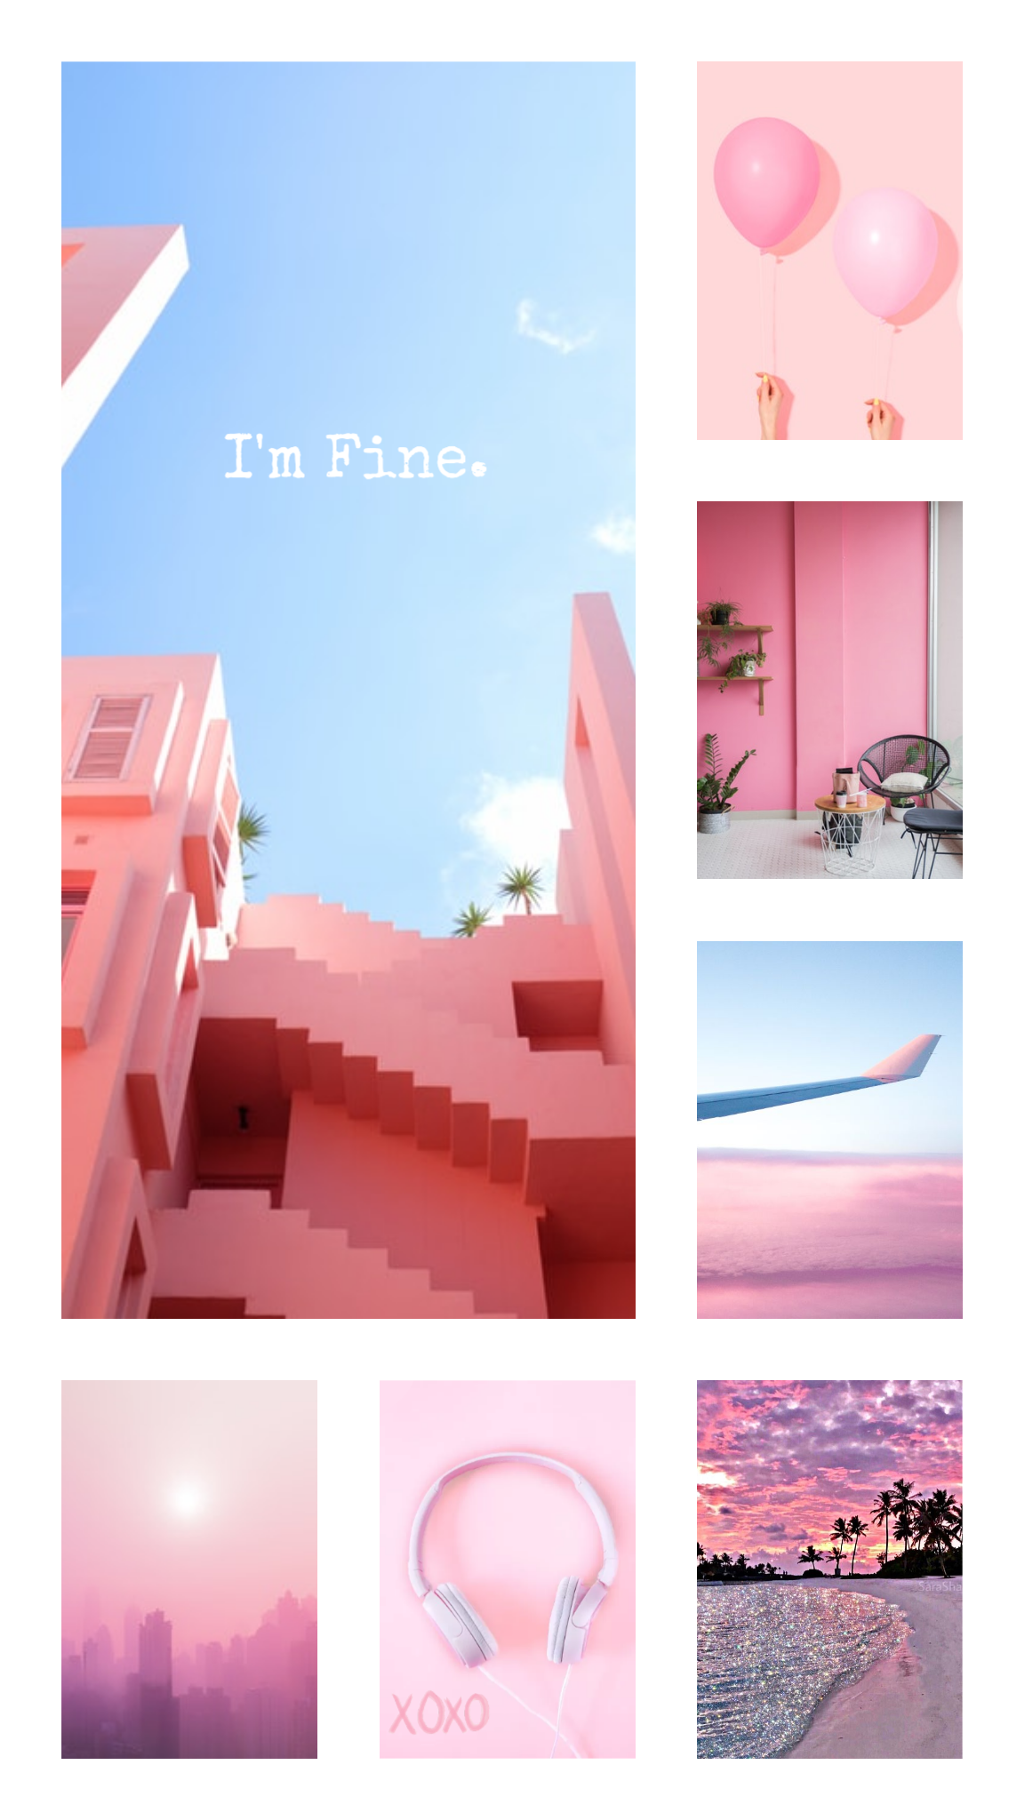 Pinky💕 #wallpaper #pink #background #lockscreen #pinky - Light Blue And Pink Aesthetic - HD Wallpaper